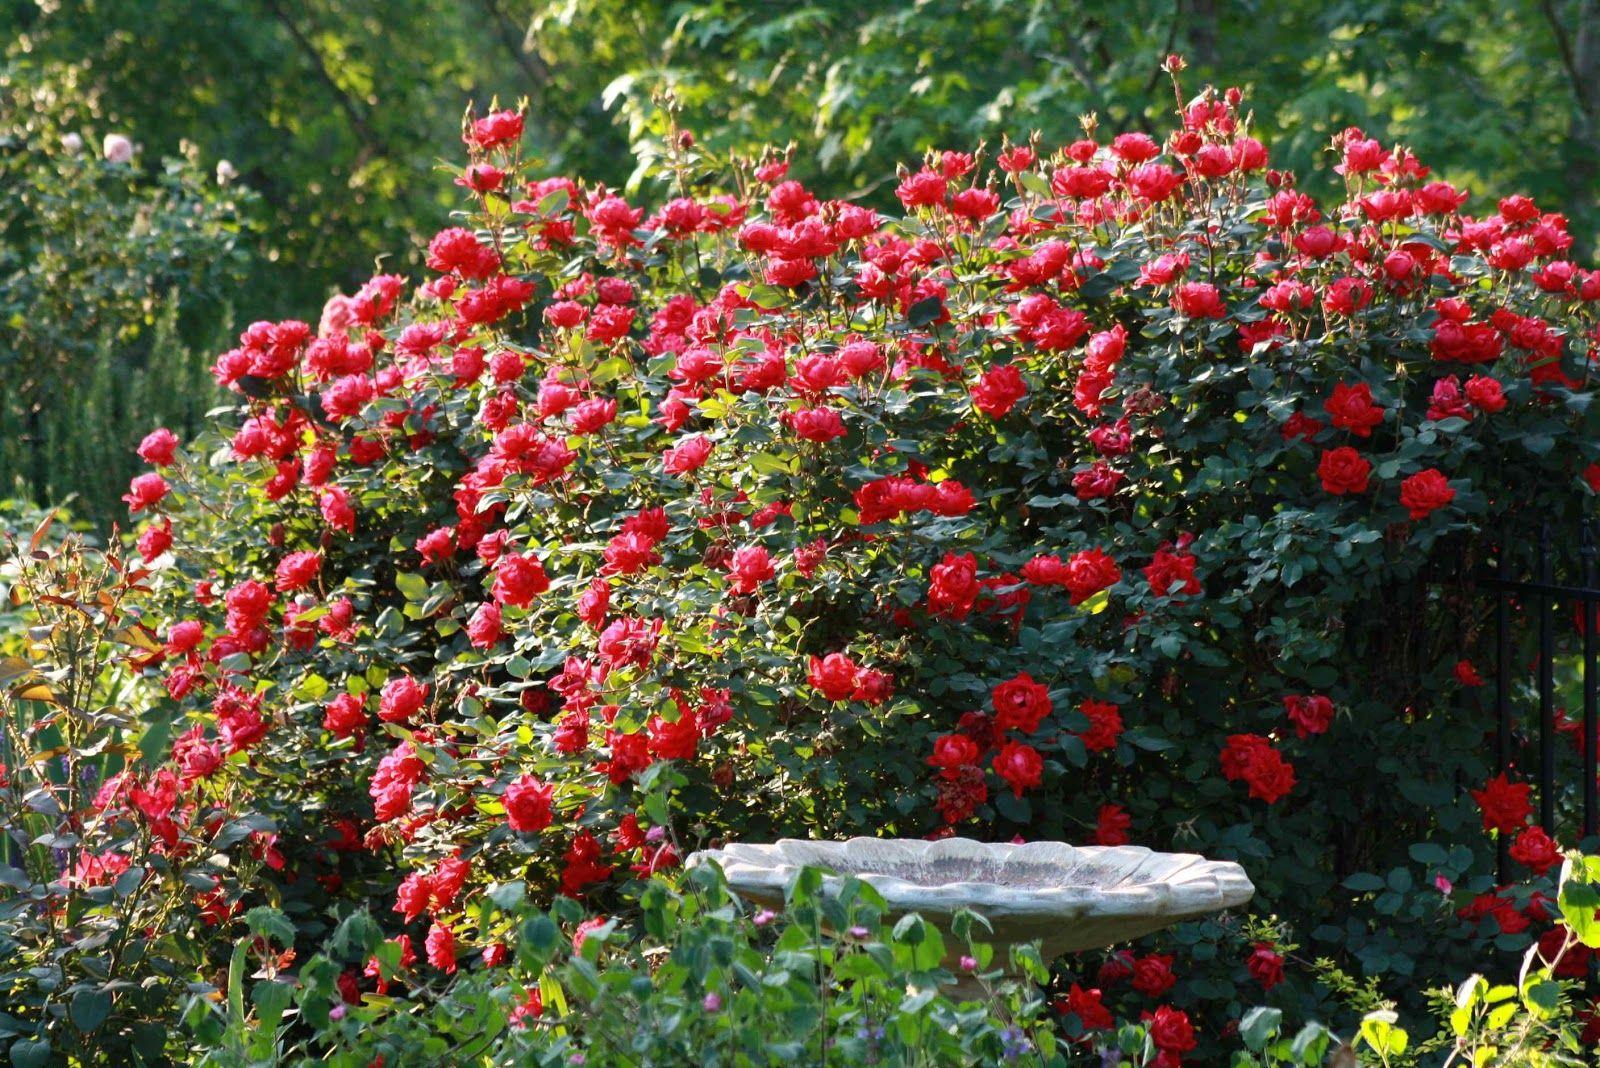 Rose flower garden pictures - Rose Garden Flowers